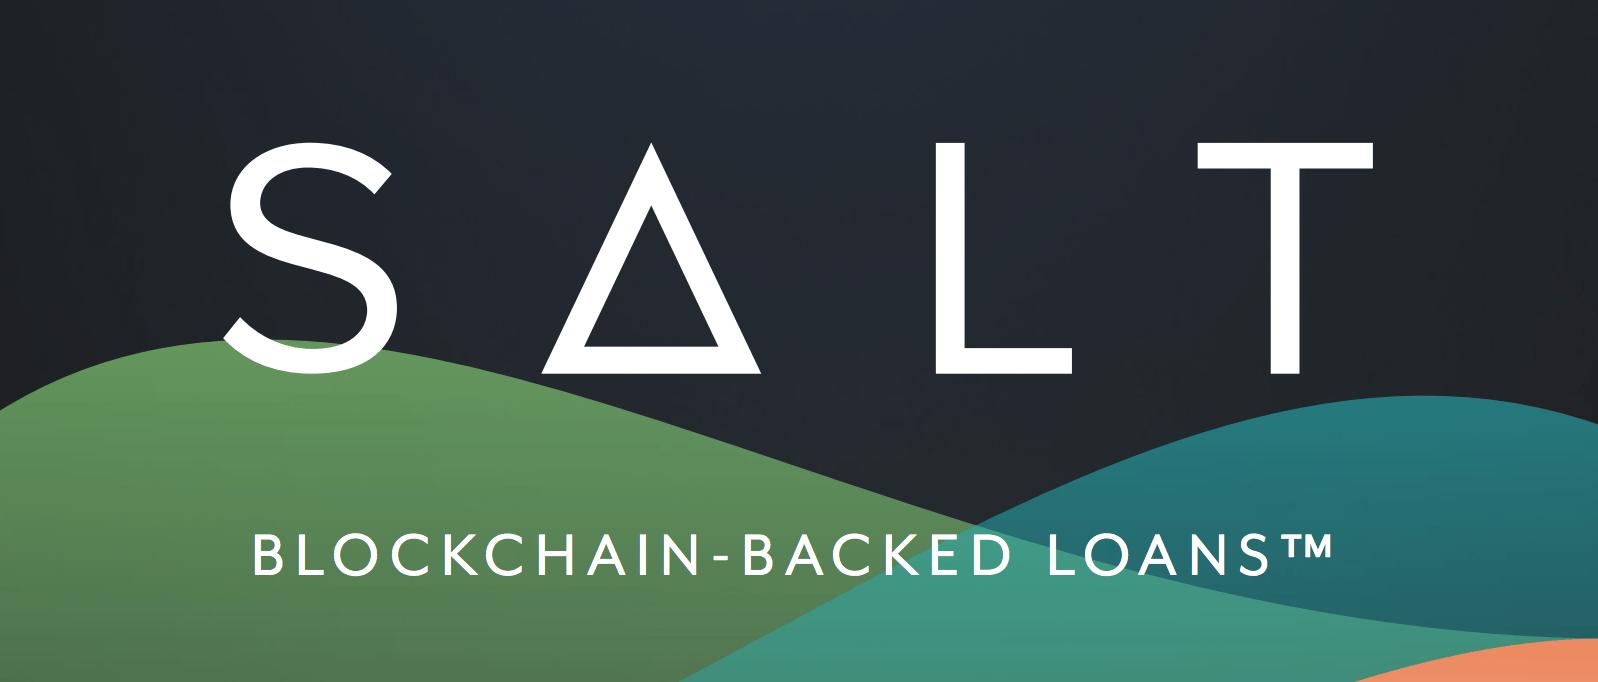 TheMerkle SALT Lending Blockchain Assets